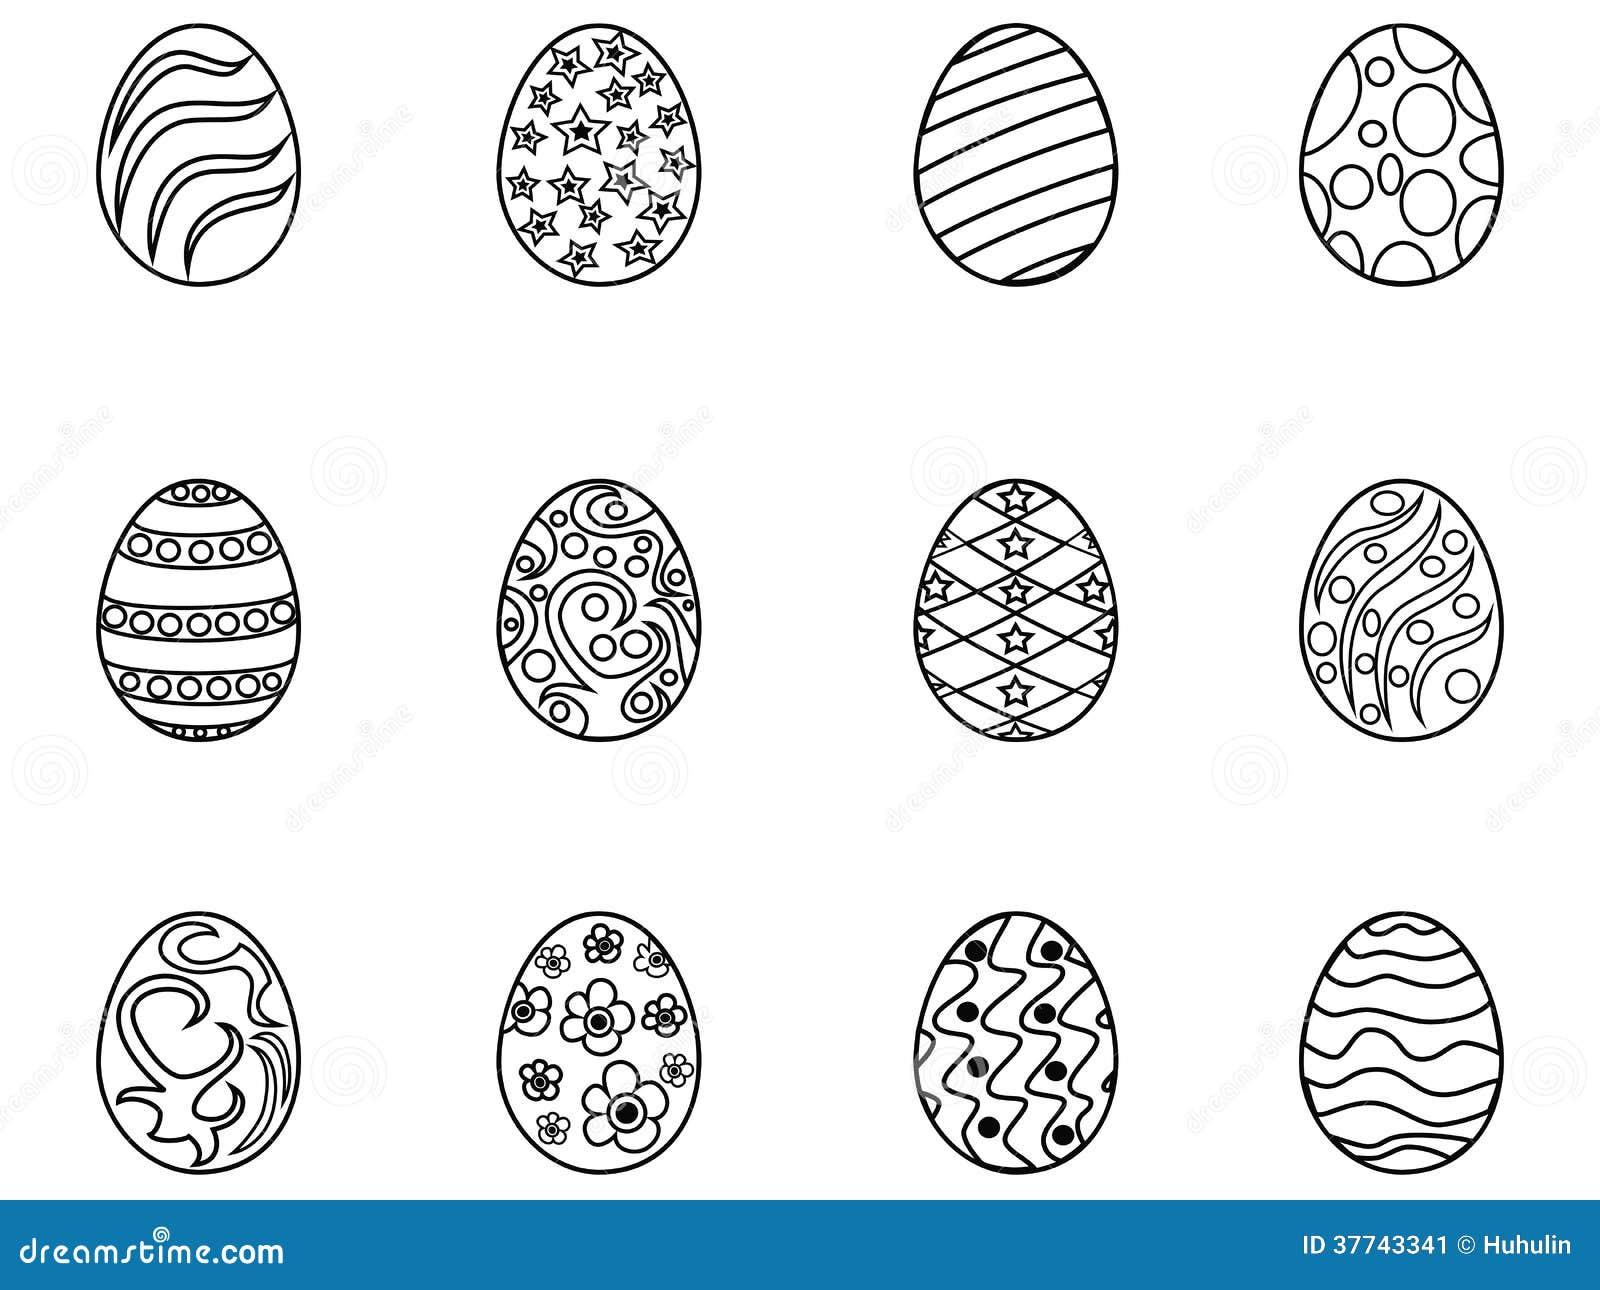 Black easter egg outline